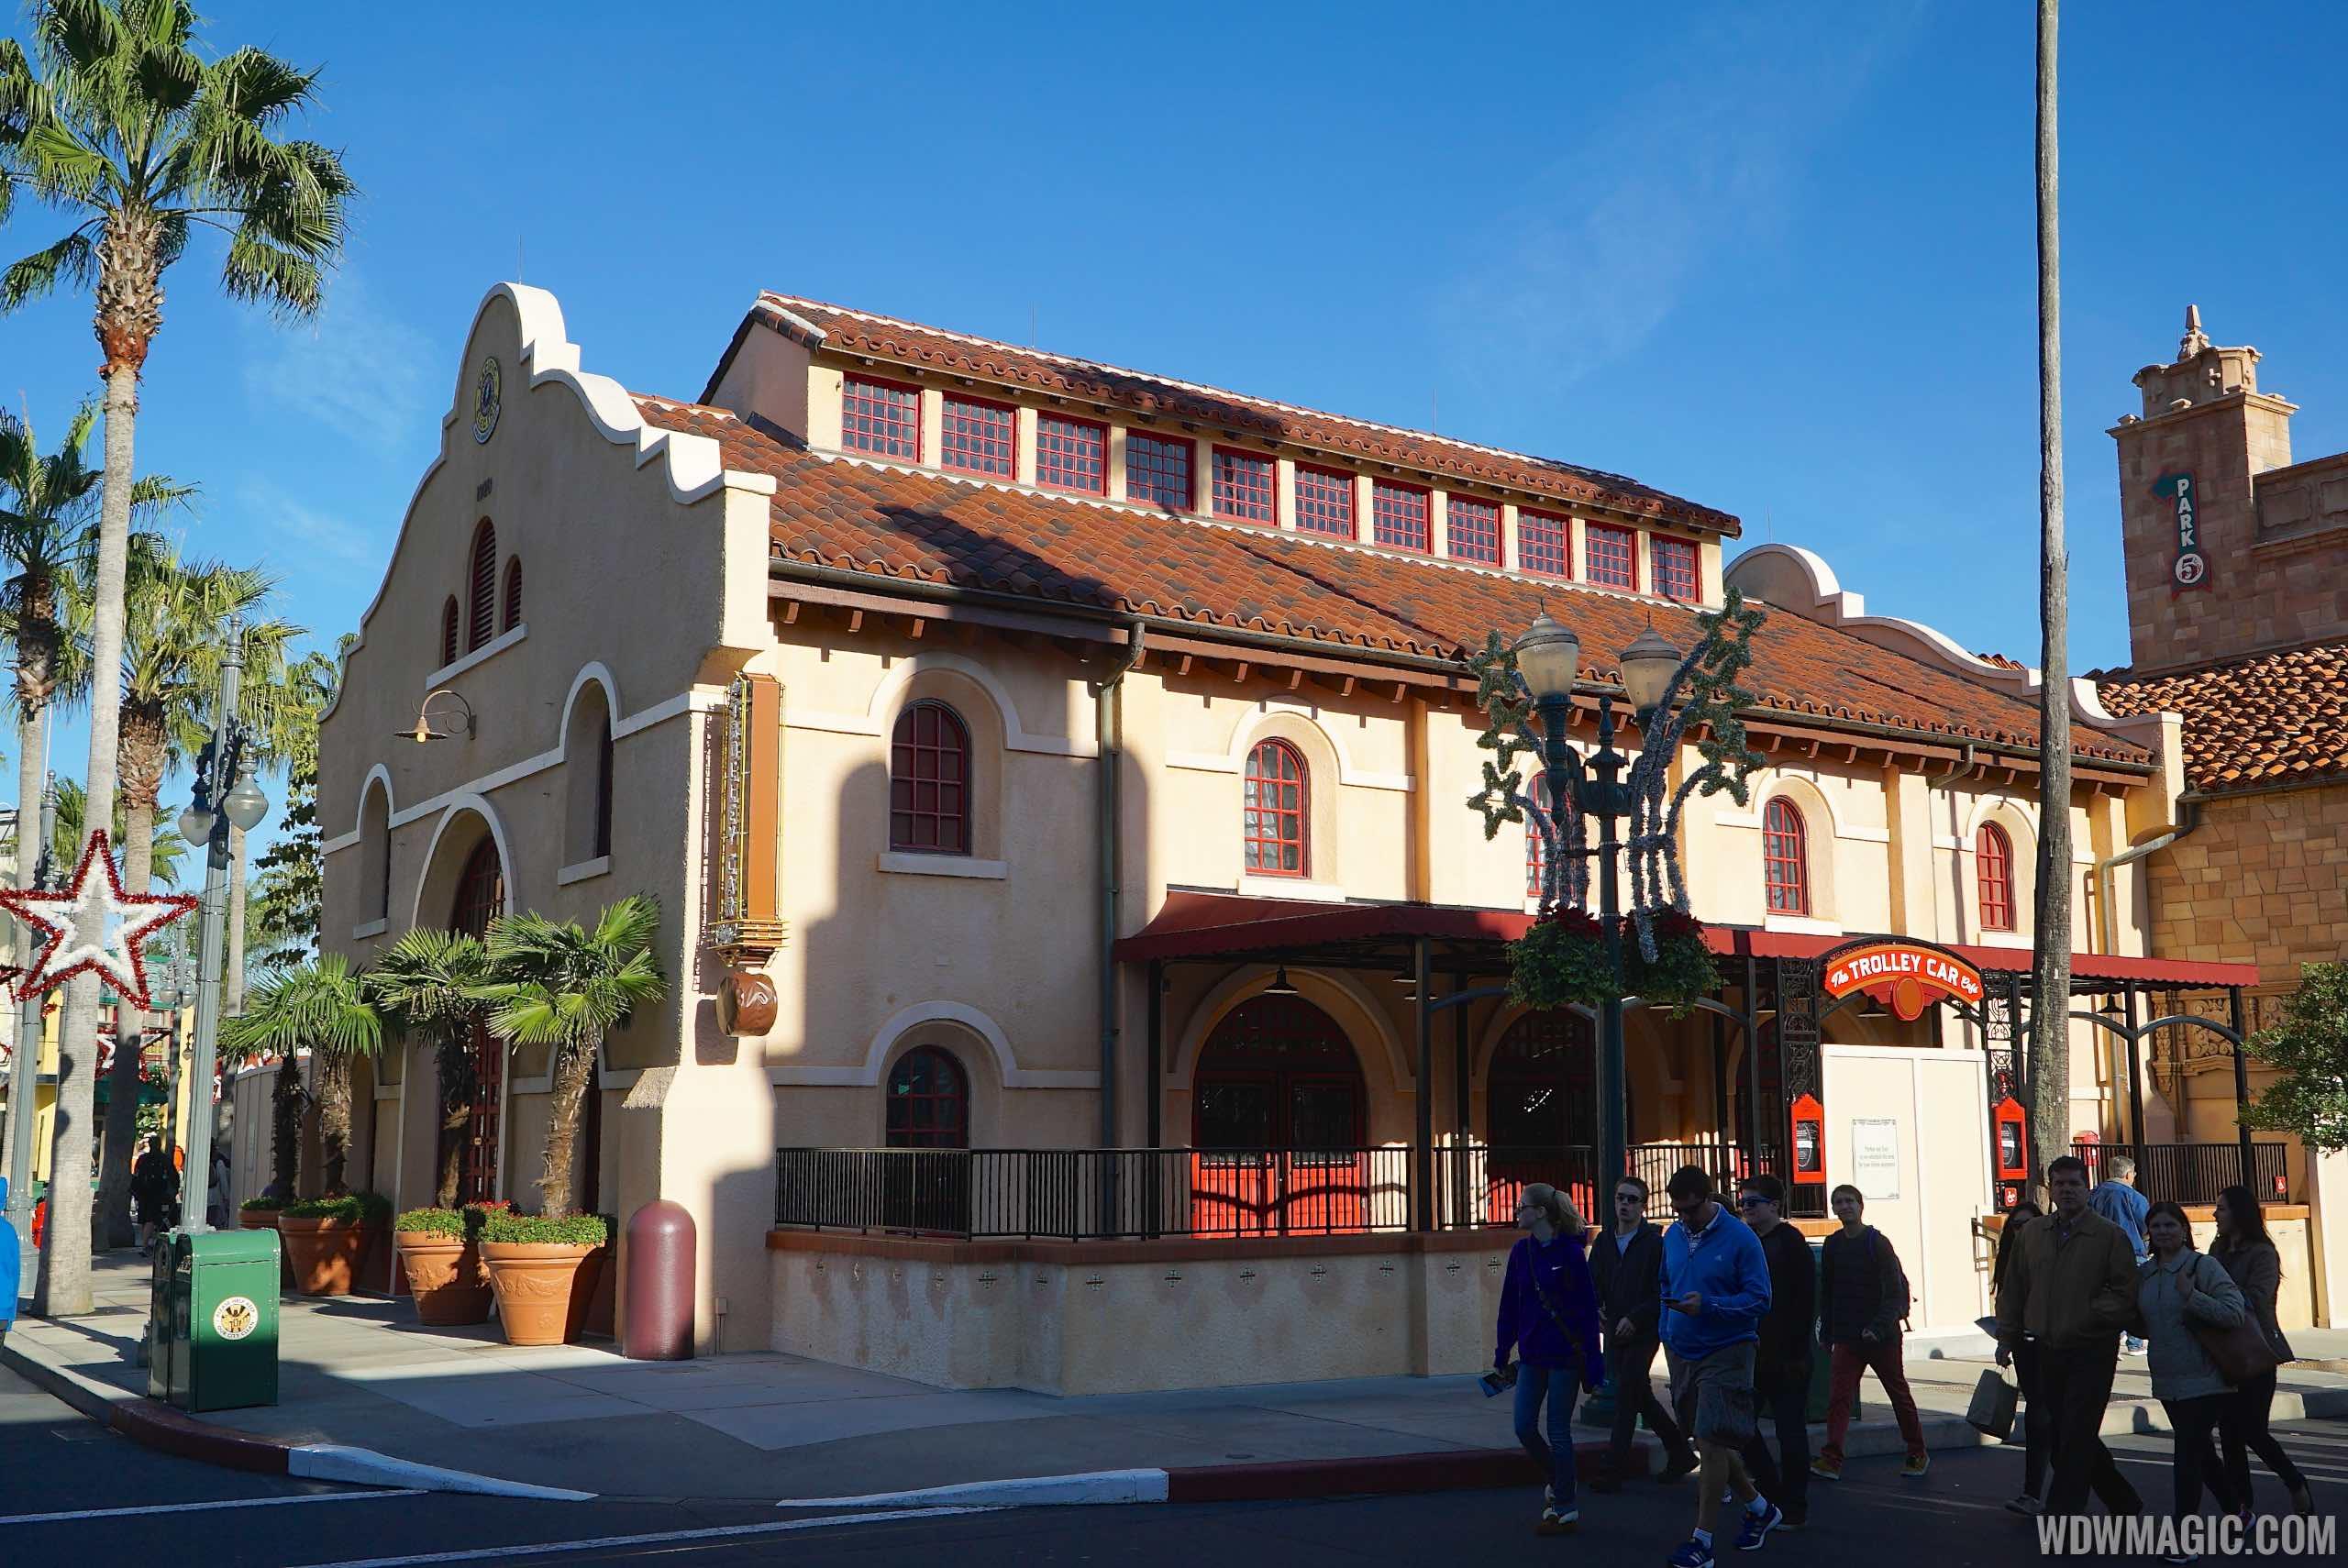 Starbucks at Disney's Hollywood Studios